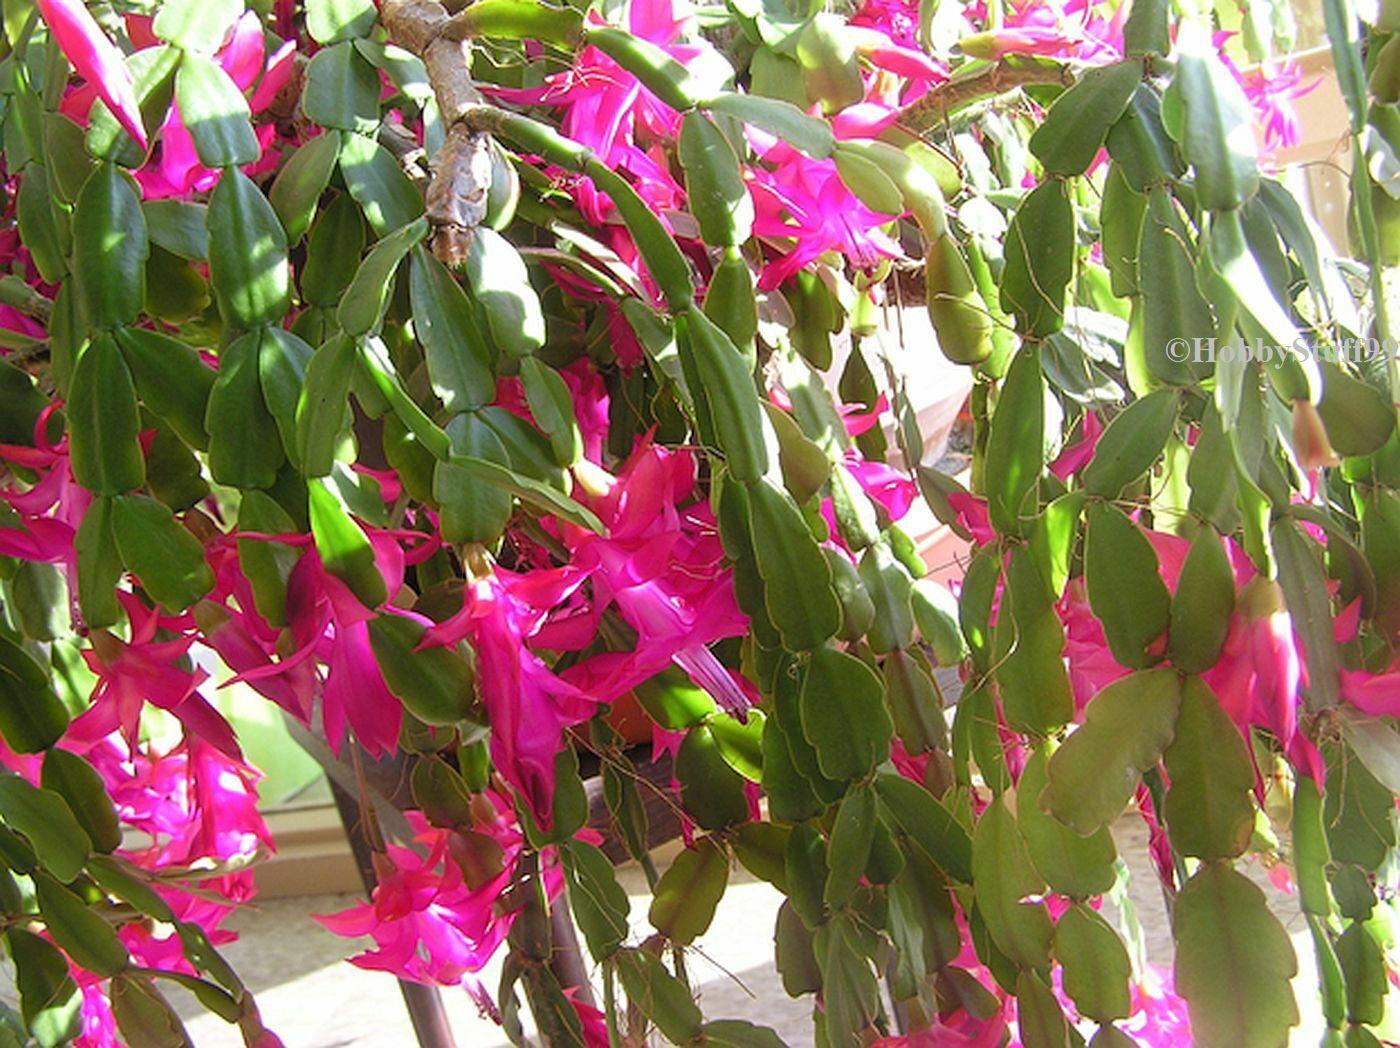 ✤ 3 Trumpet Vine Bare Root Plants Dormant Campsis radicans 2 Yrs Old